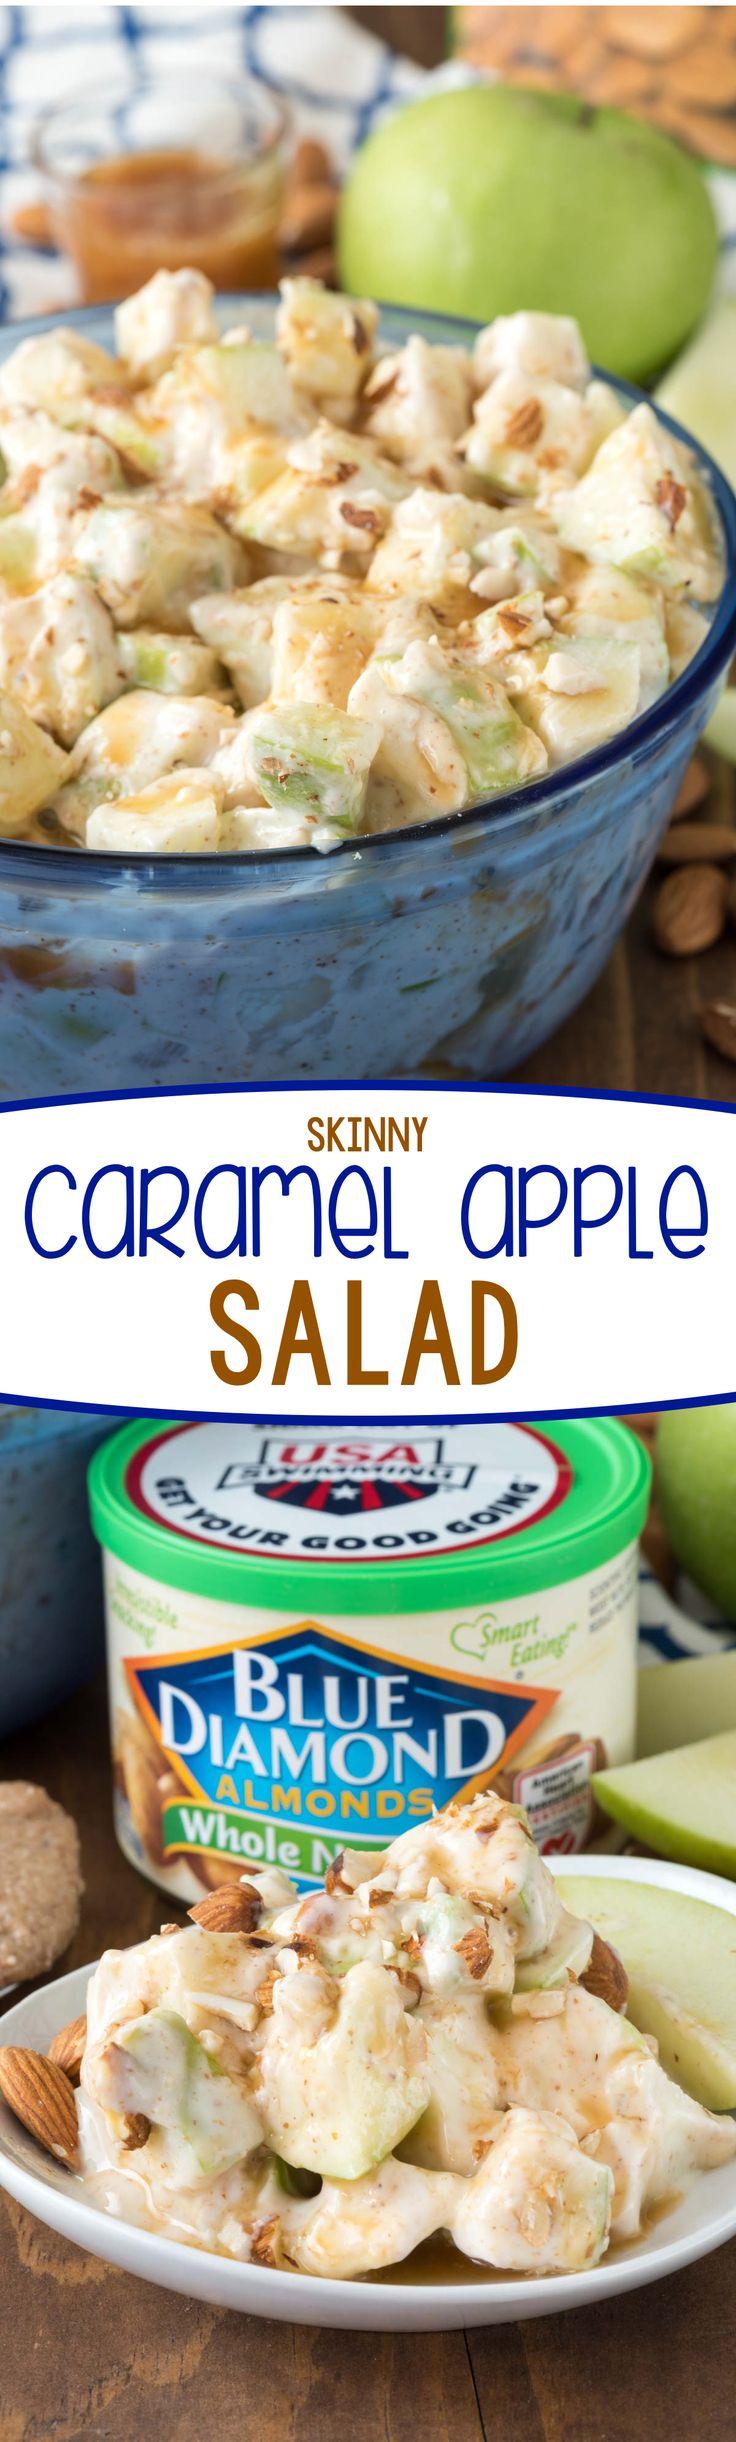 Skinny Caramel Apple Salad Recipe